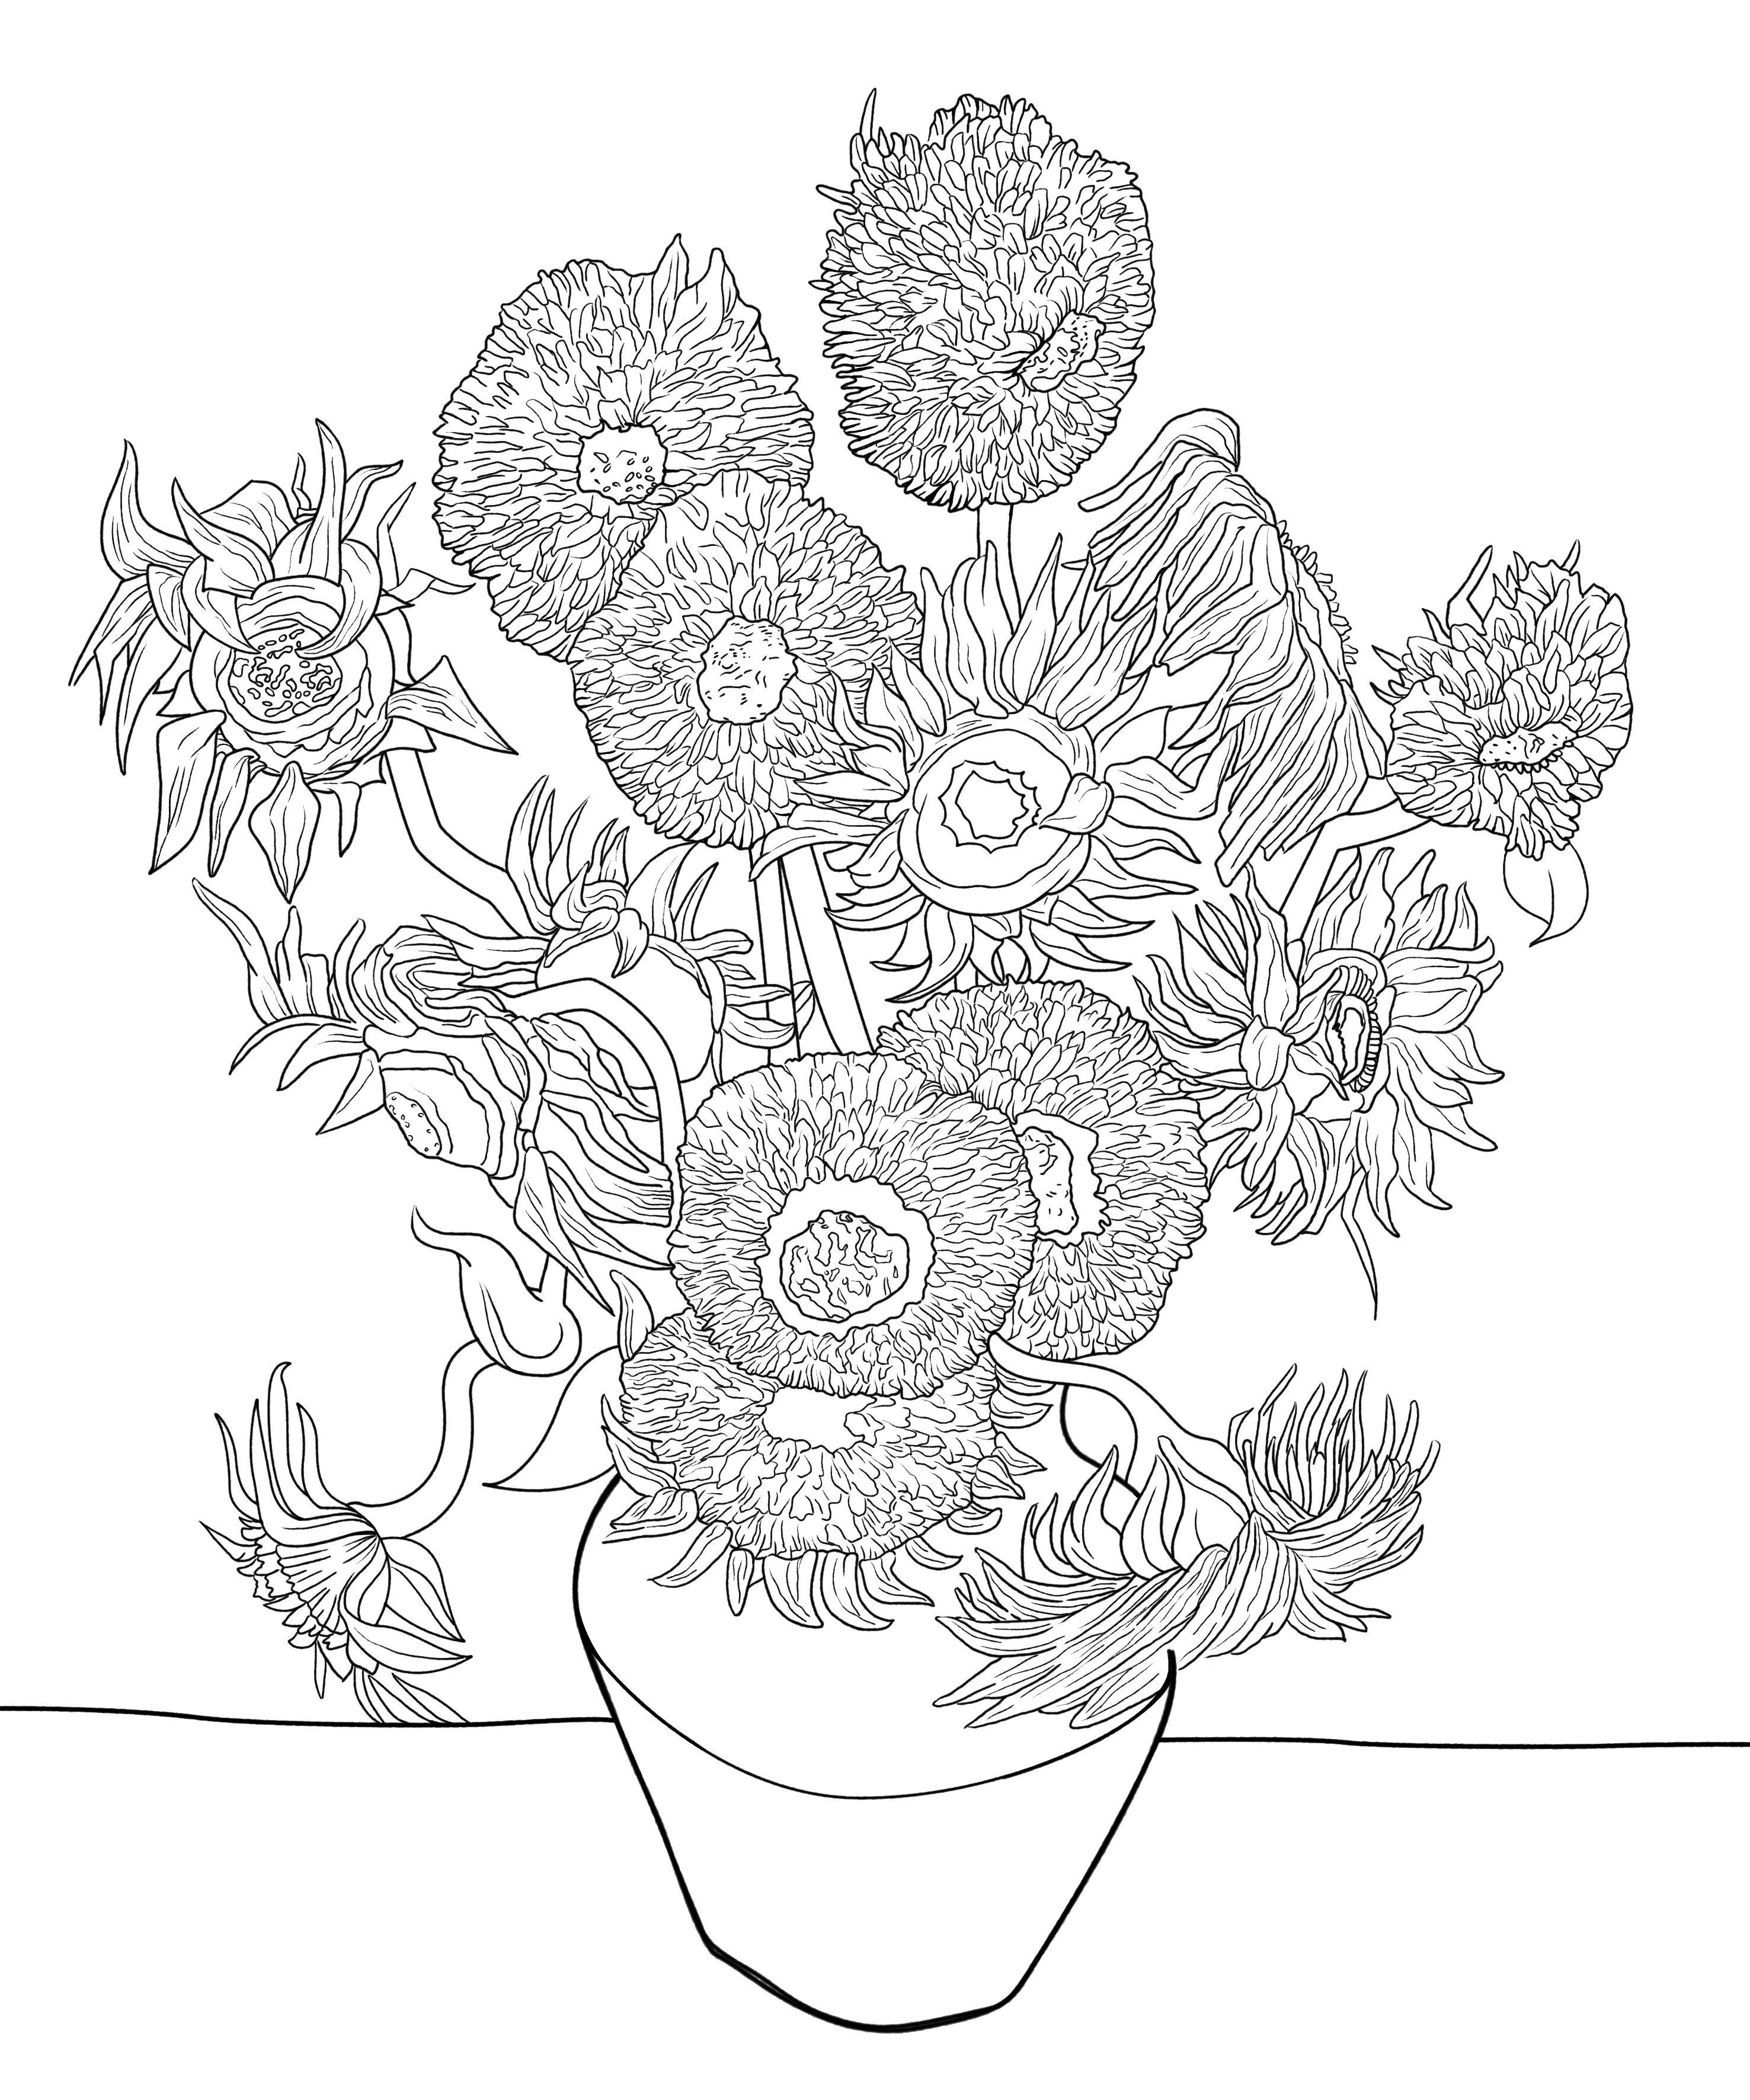 Van Gogh Flower Coloring Sheets Designs Coloring Books Van Gogh Coloring